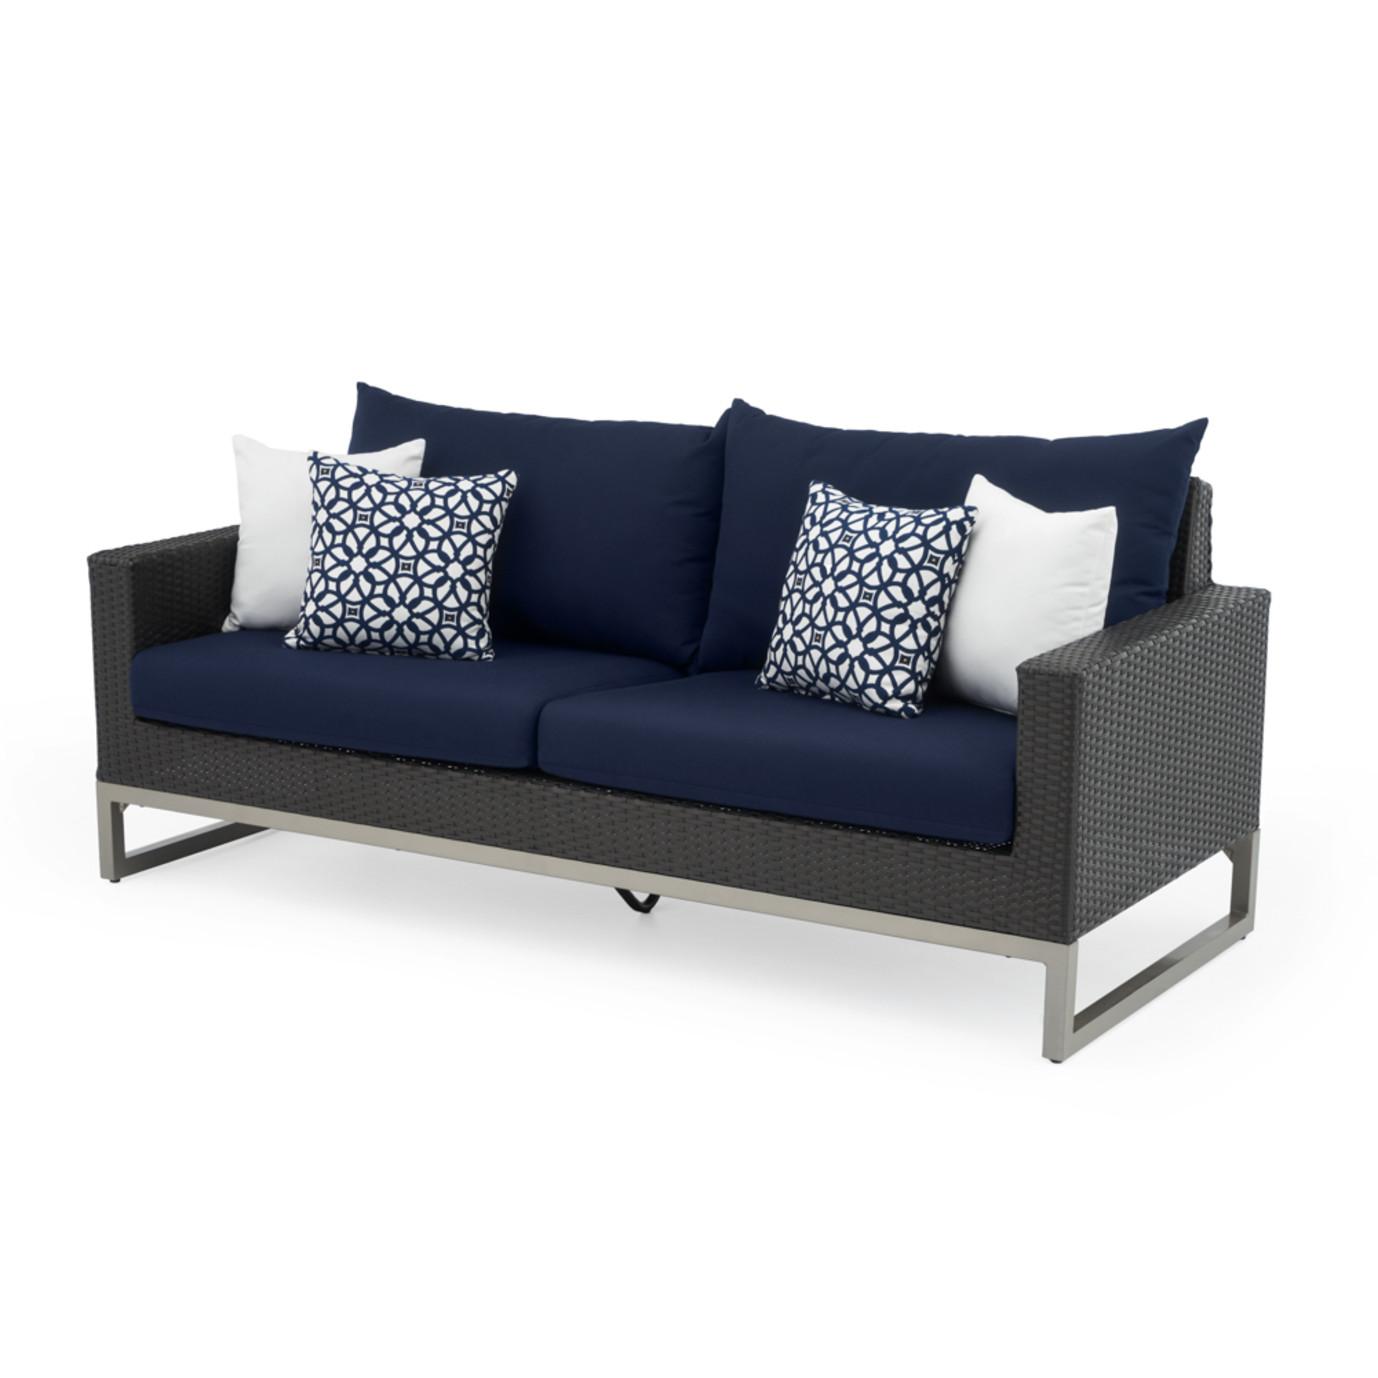 Milo™ Espresso 78in Sofa - Navy Blue